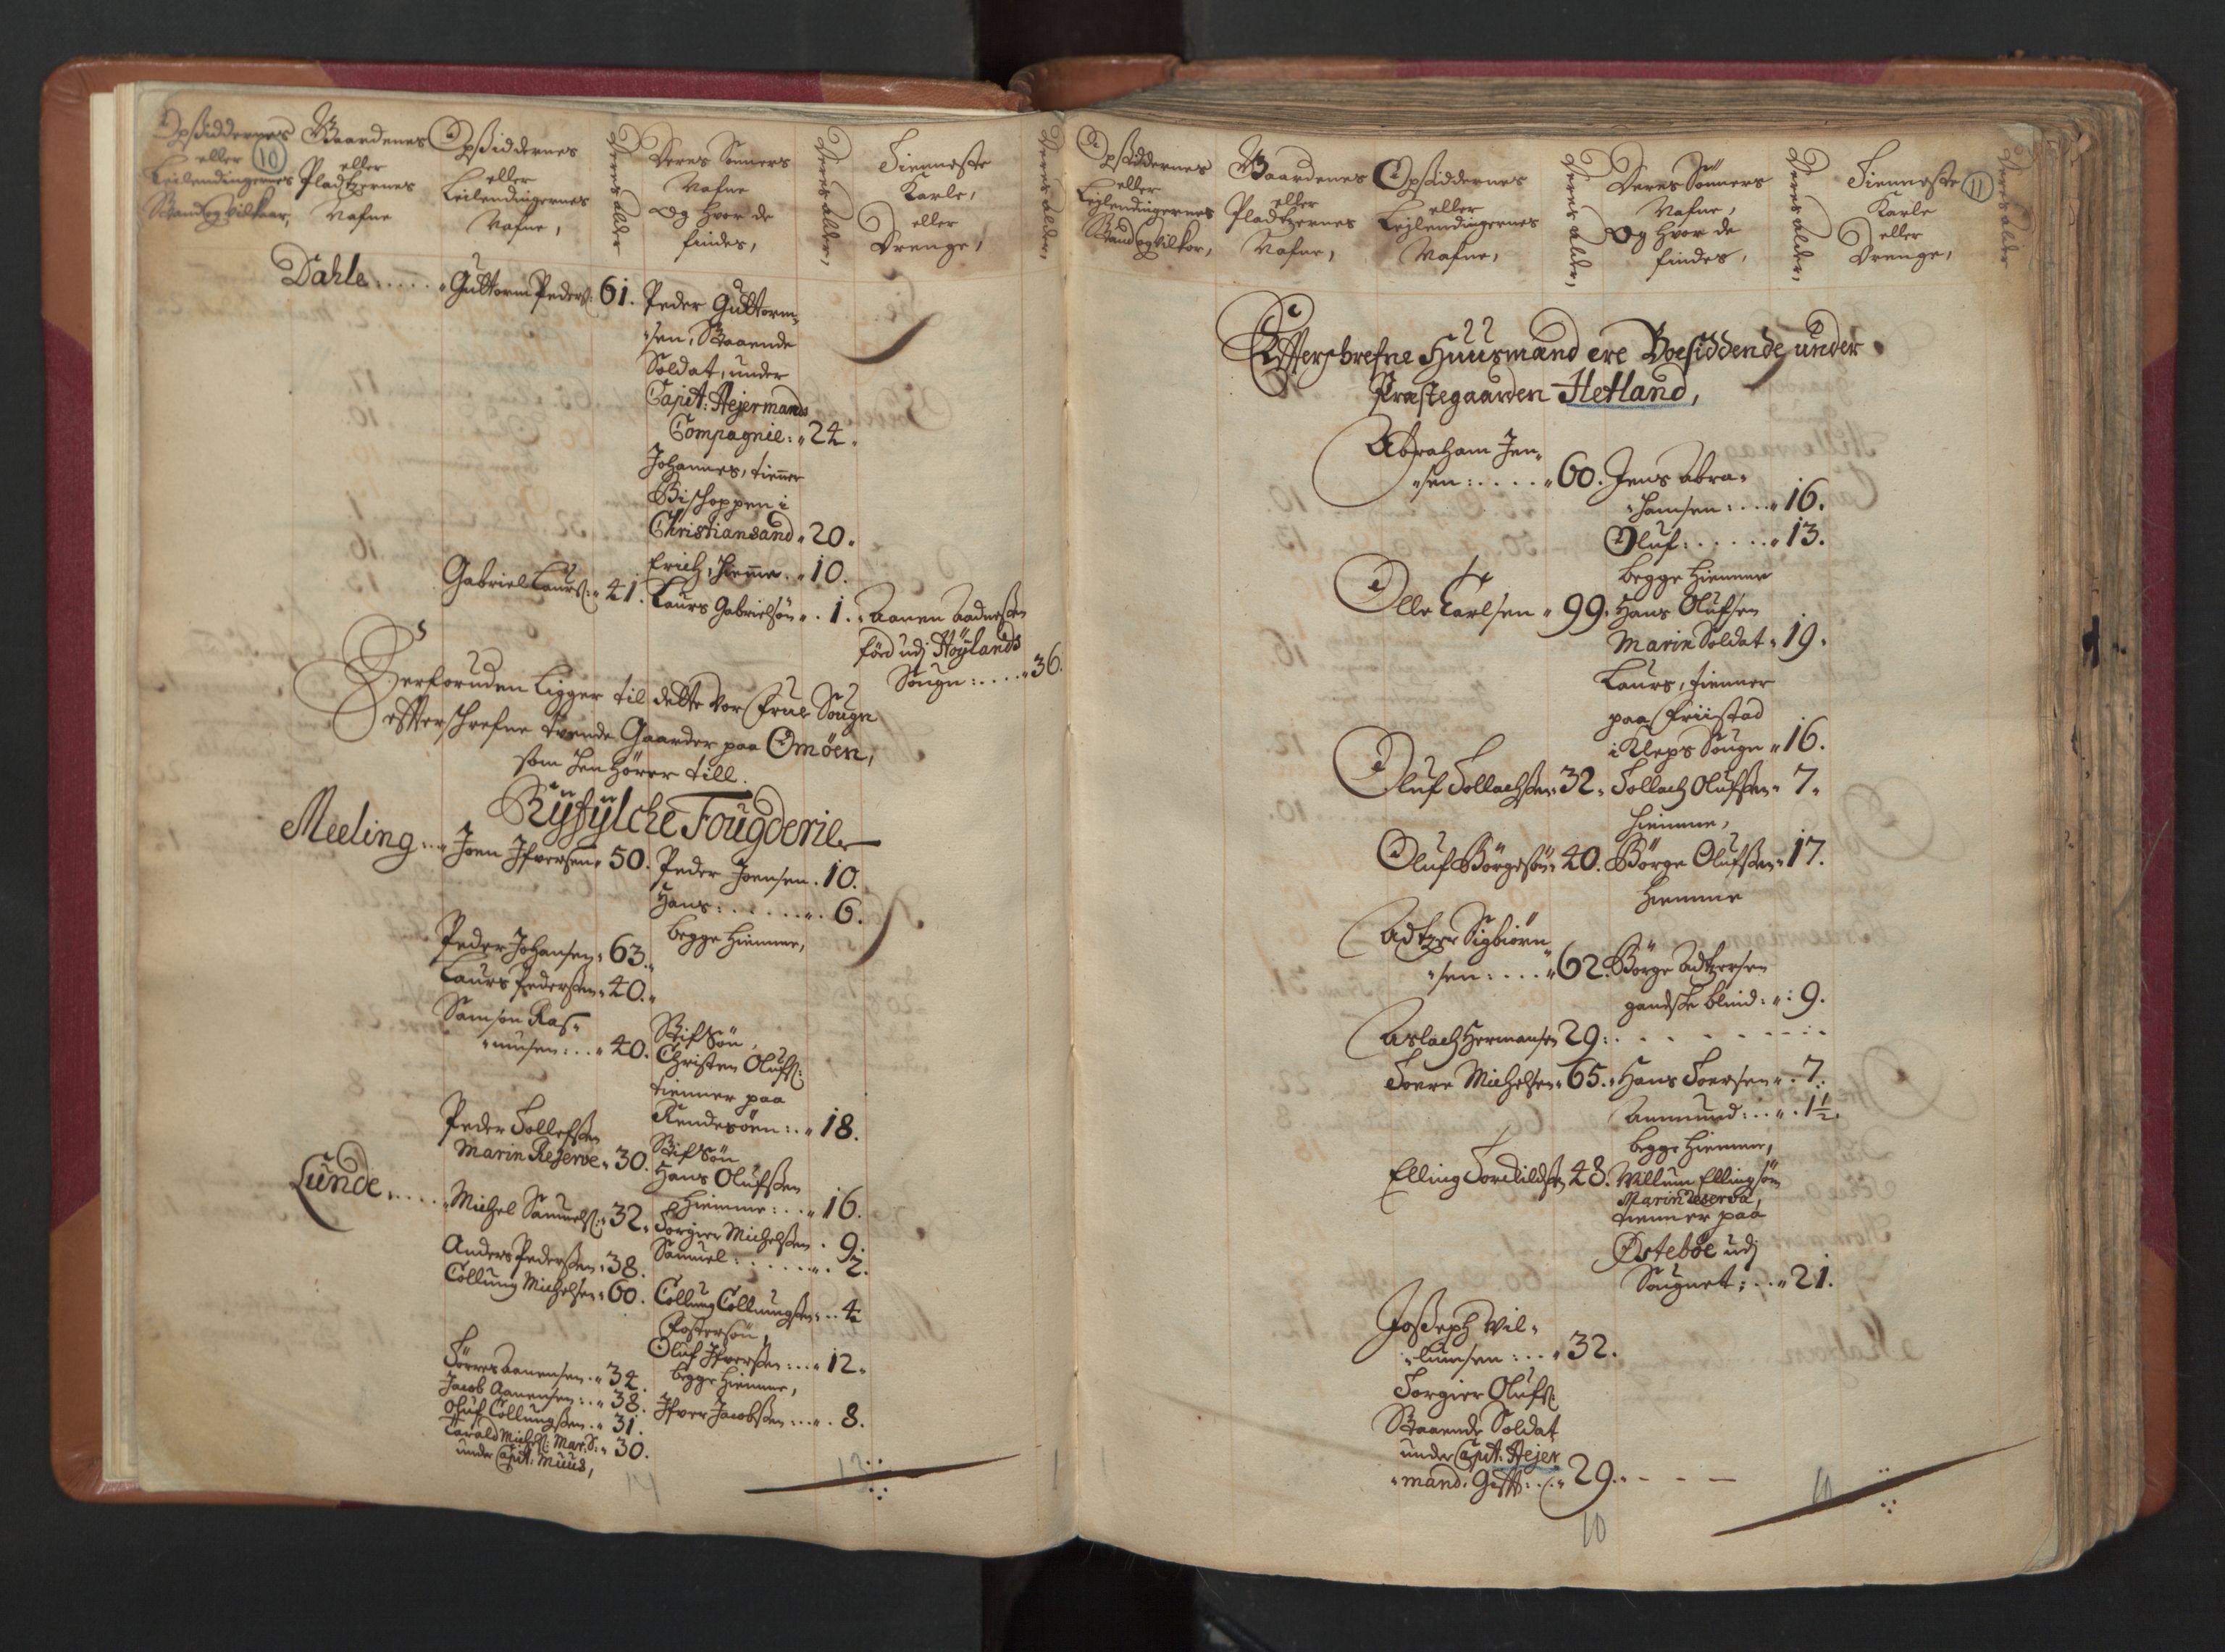 RA, Manntallet 1701, nr. 4: Jæren og Dalane fogderi, 1701, s. 10-11